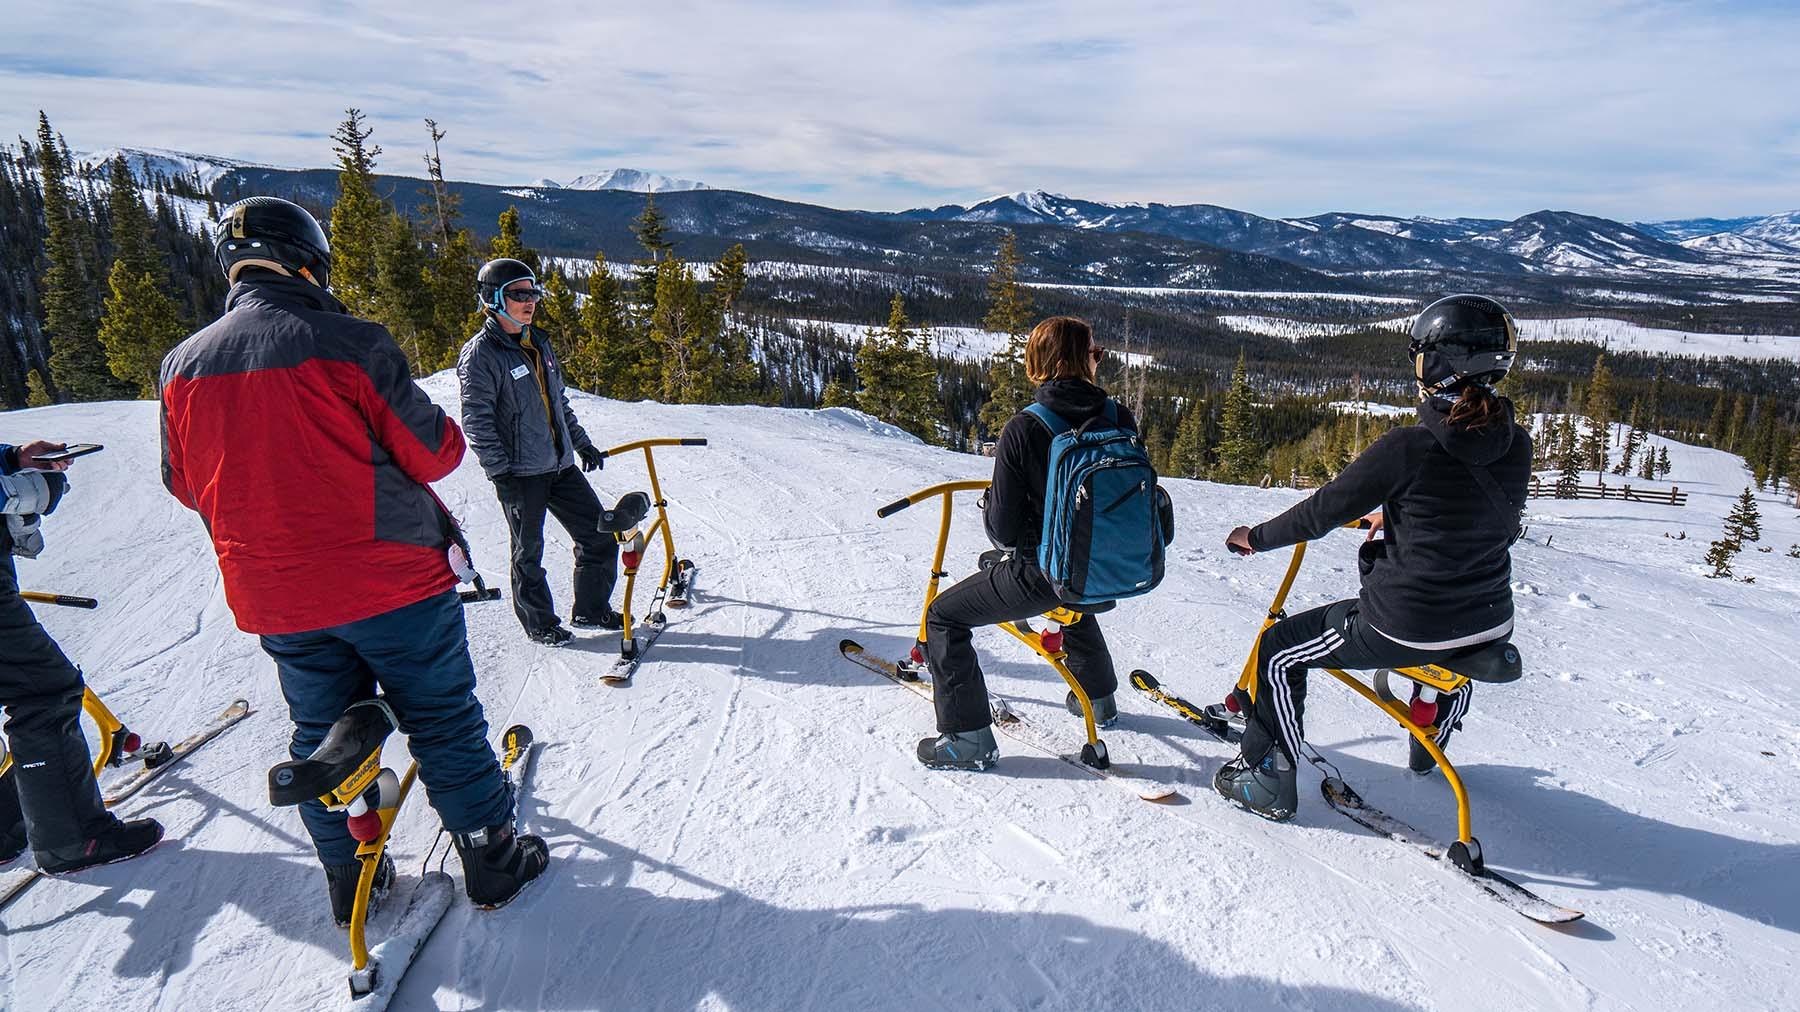 ski bike tours at winter park resort